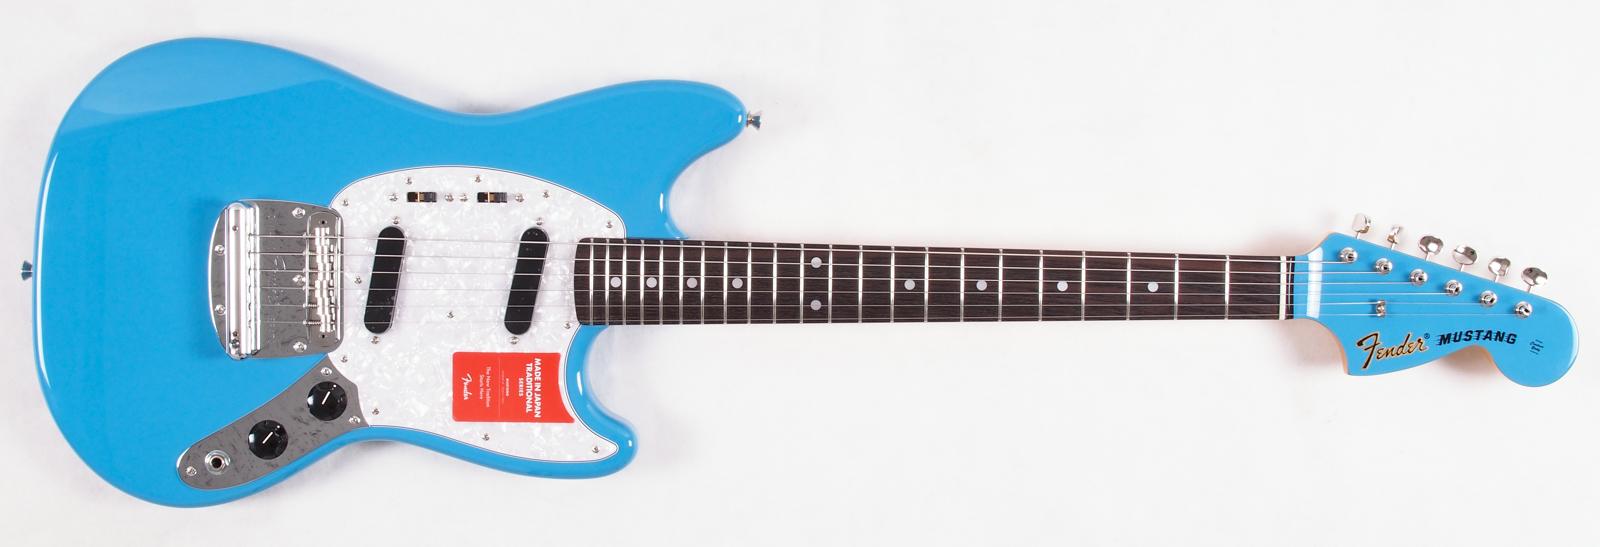 Fender FSR Japan Mustang California Blue